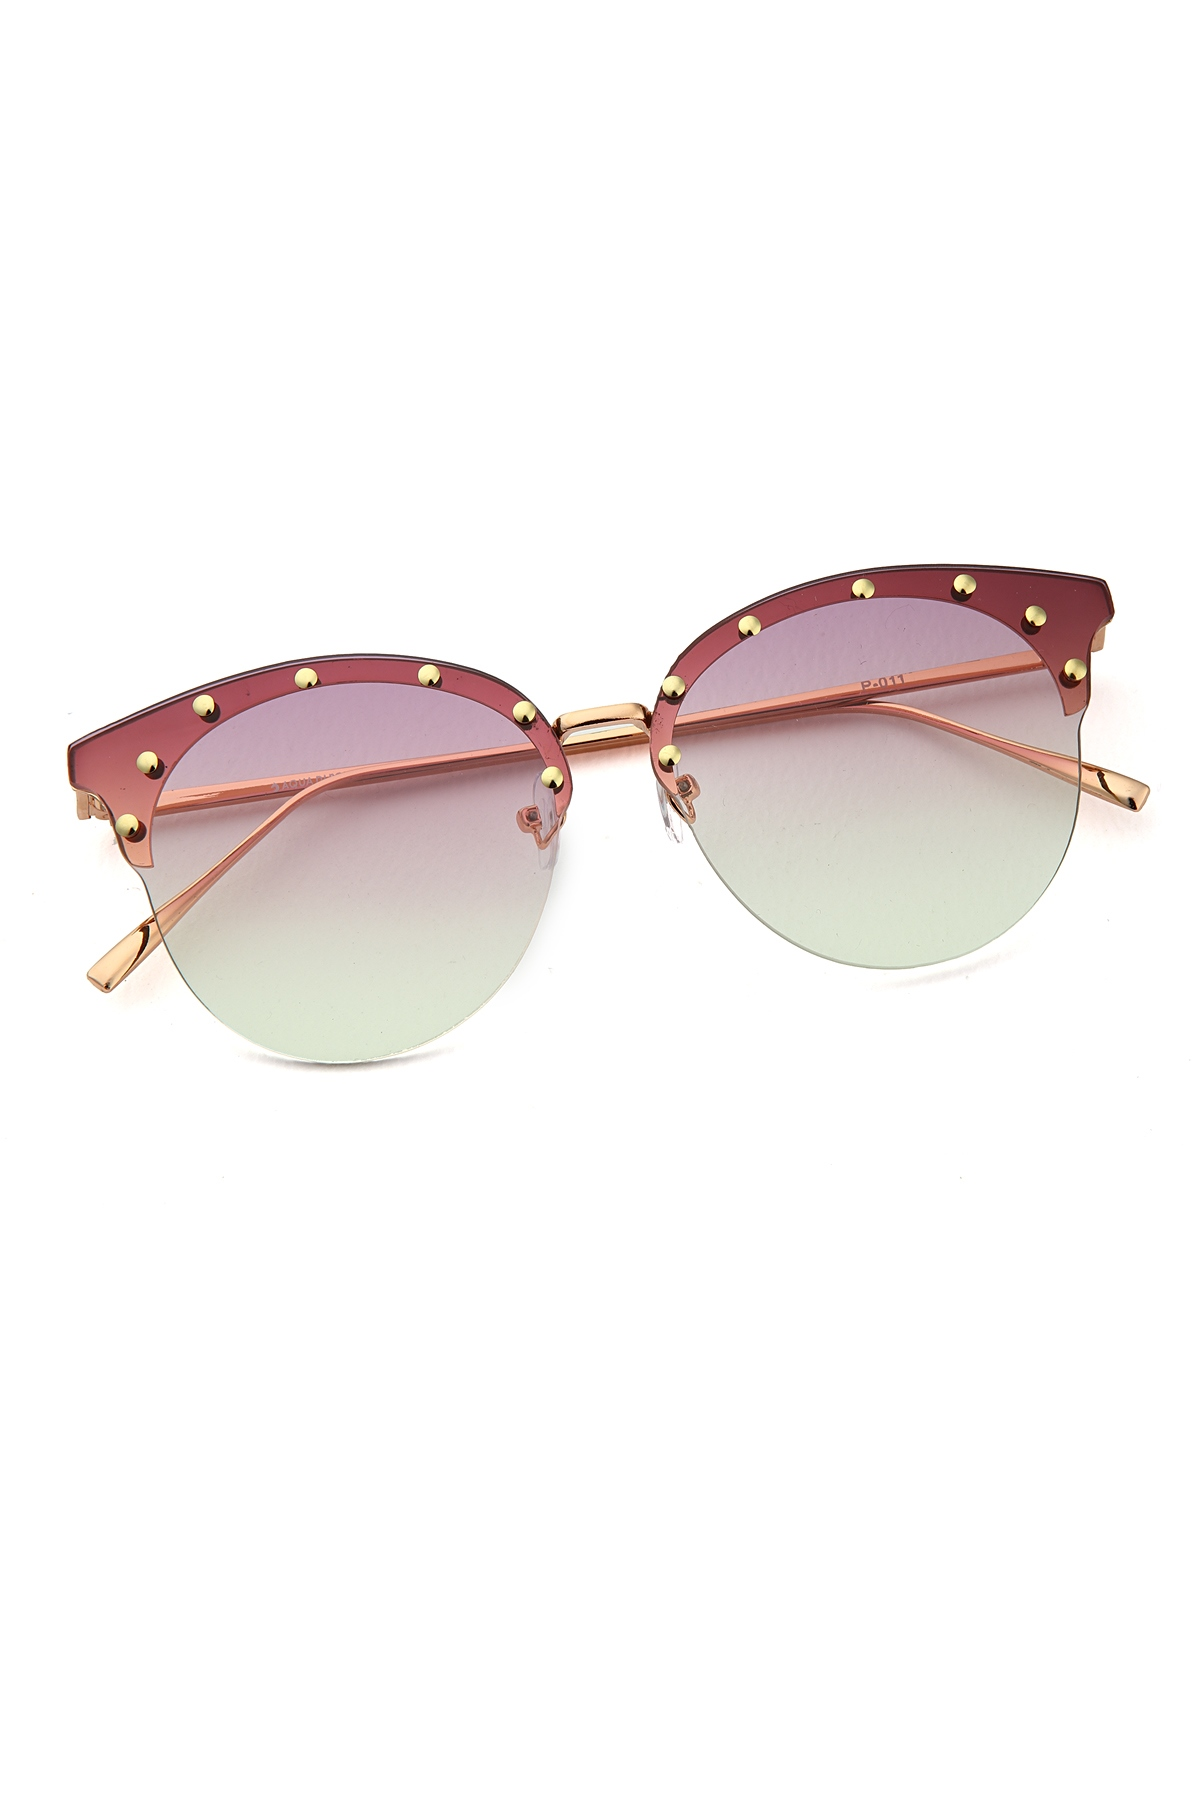 Aqua Di Polo APGS3-G5291-KMY2M Women/Girl Sunglasses